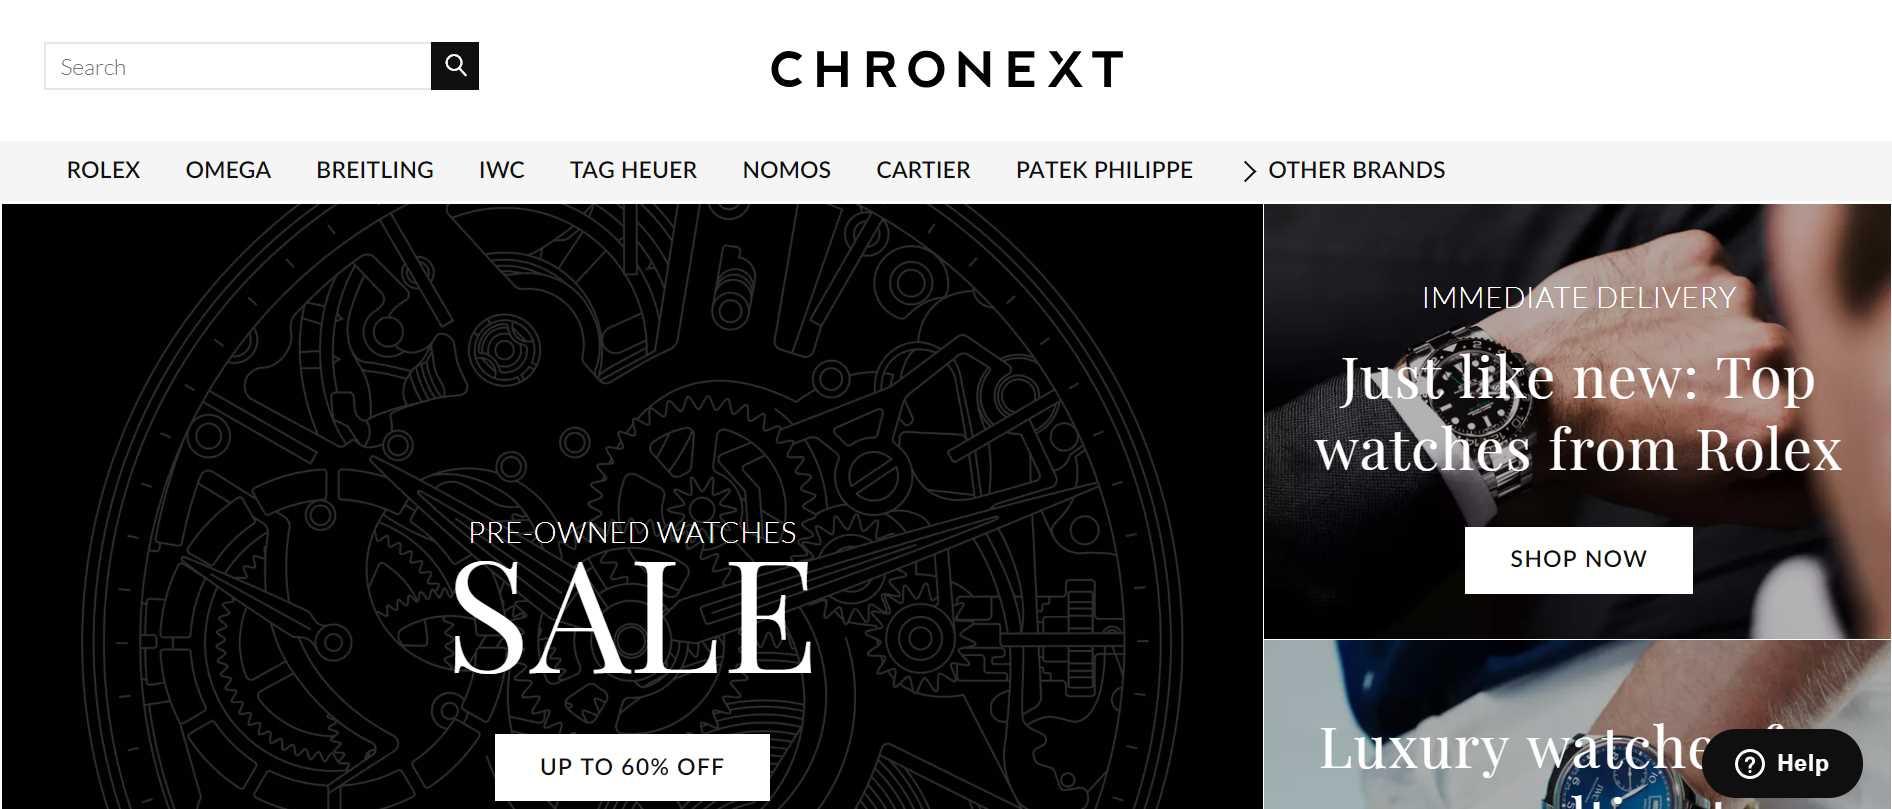 chronext luxury watches online black friday